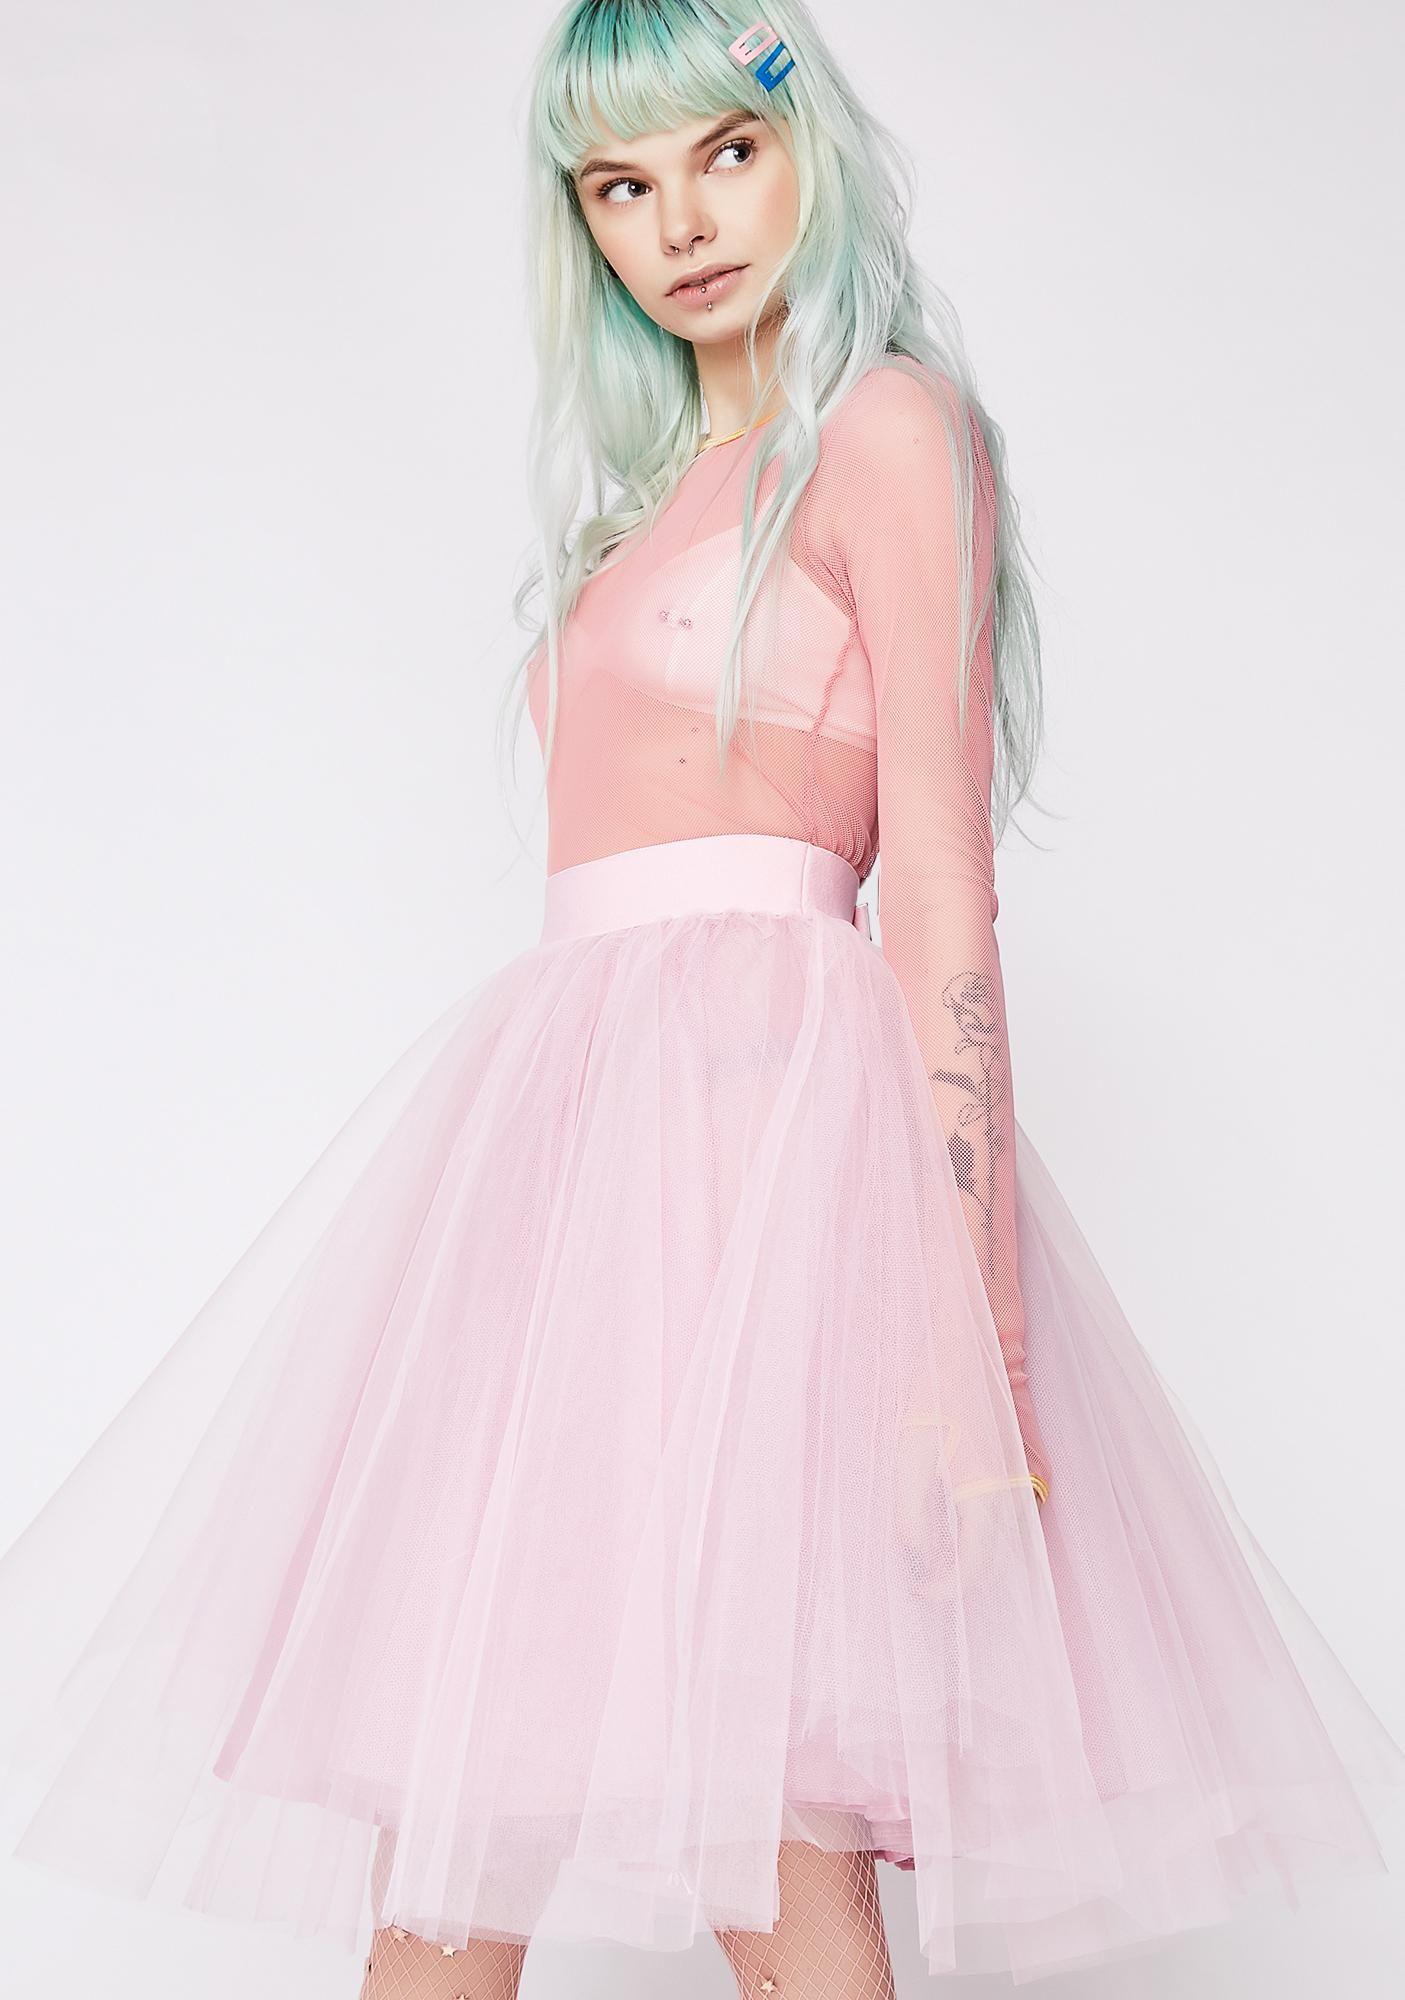 4363705e0 Lil Princess Tutu Skirt | Clothes | Skirts, Tutu, Princess tutu